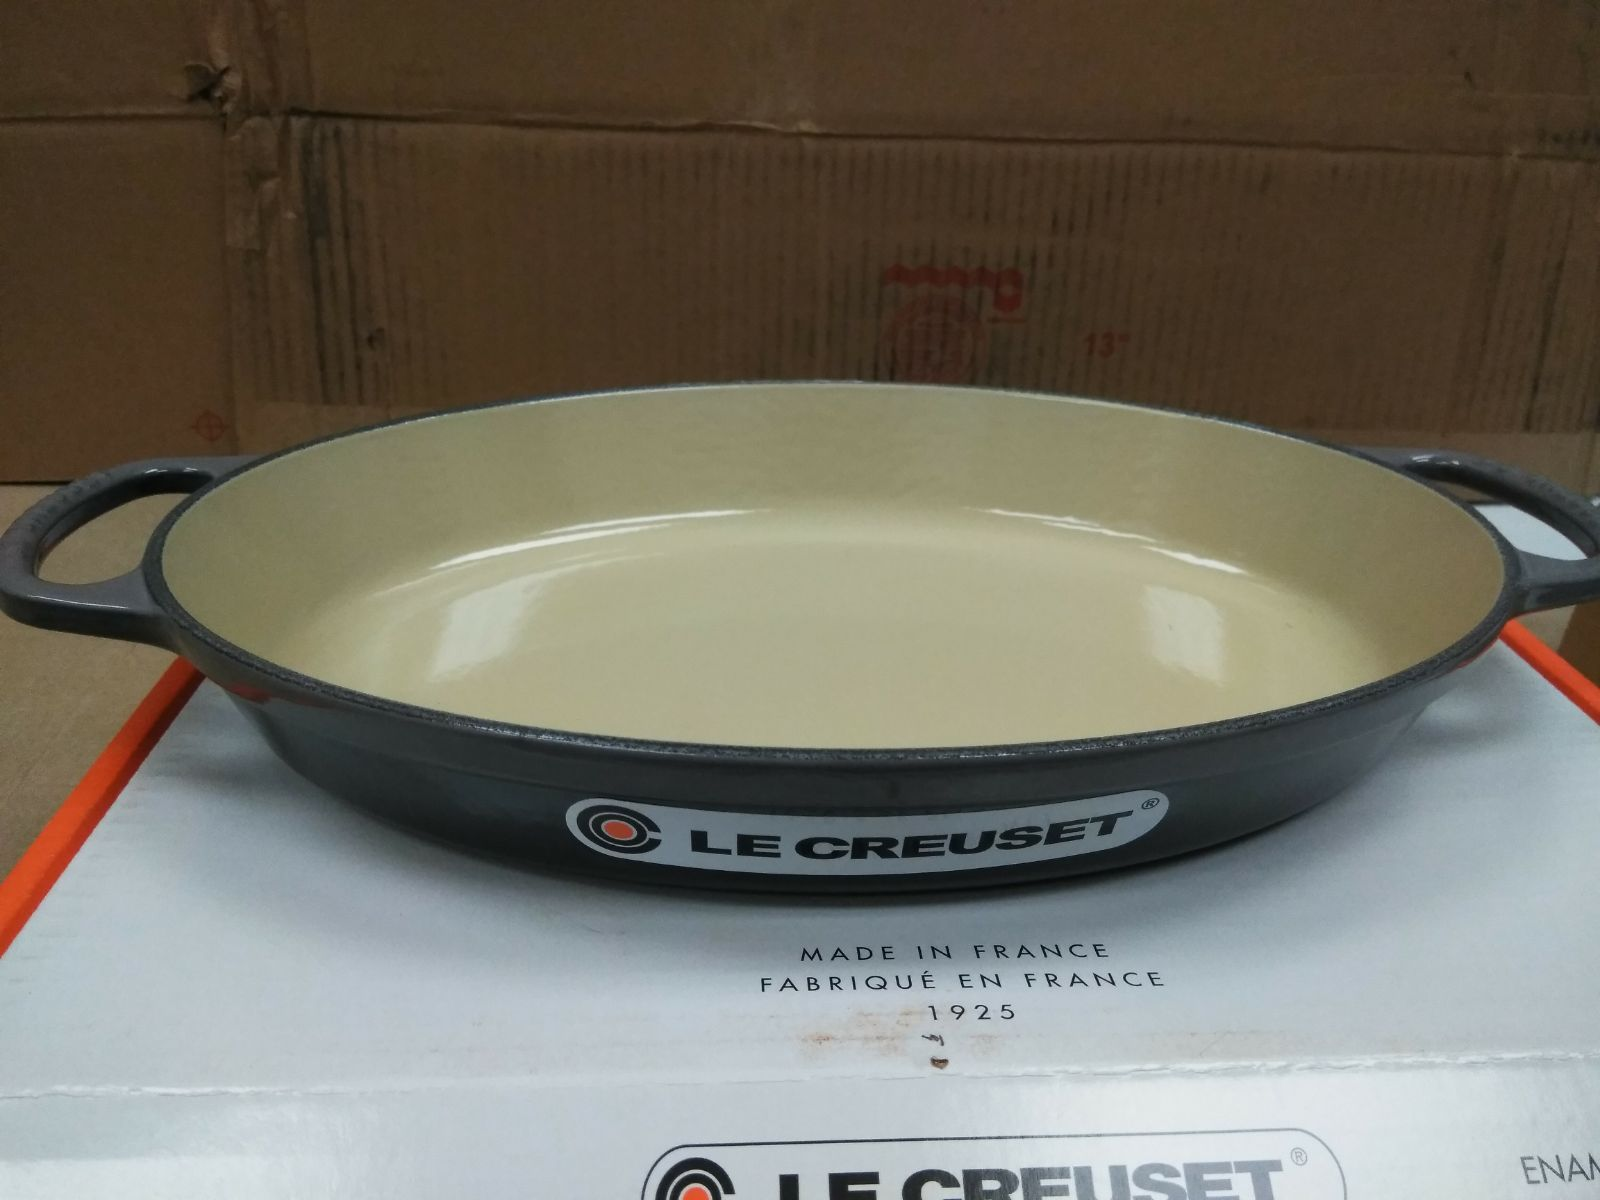 Le Creuset Oval Cast Iron Baker Size 2 25 Qt 32 Cm Color Oyster Flint Gray Brand New In Original Box Lifetime Warranty Creuset Le Creuset Cookware Oysters Le creuset oval baking dish